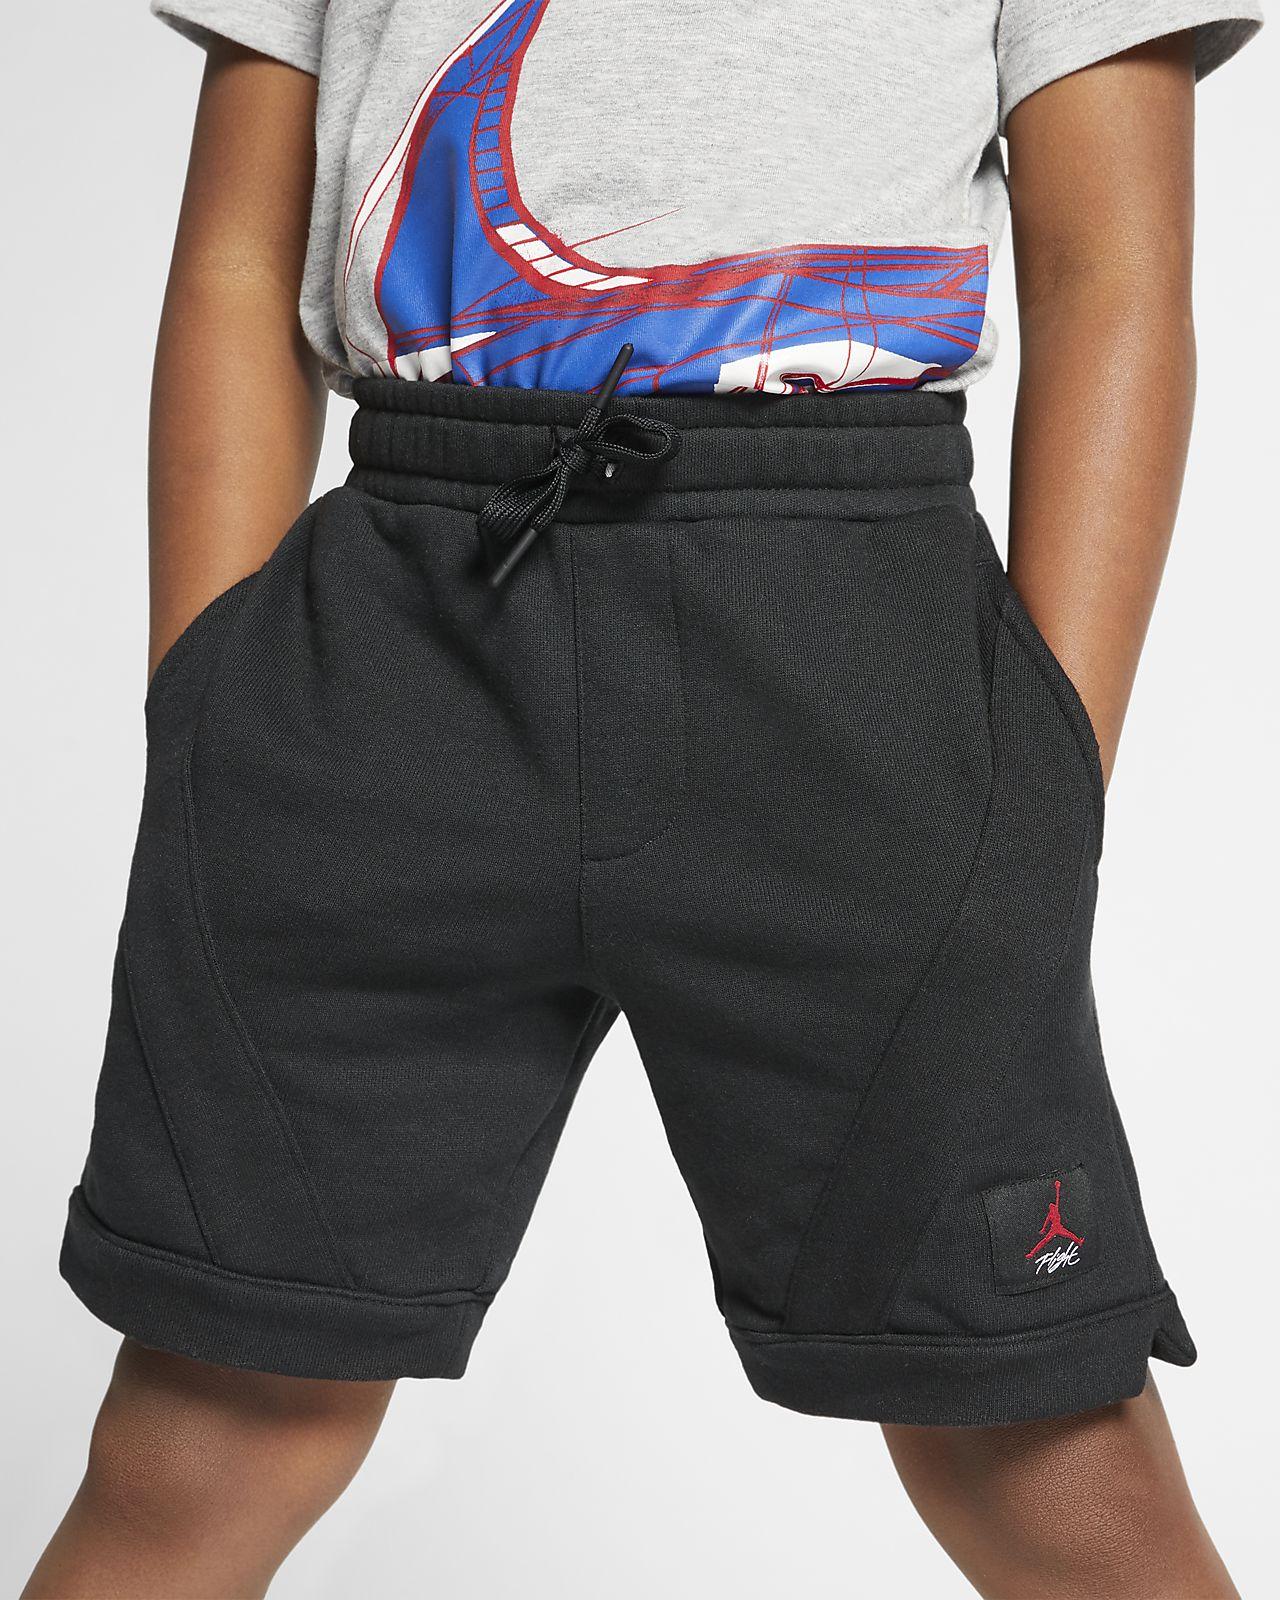 Jordan Flight Lite Pantalón corto - Niño/a pequeño/a